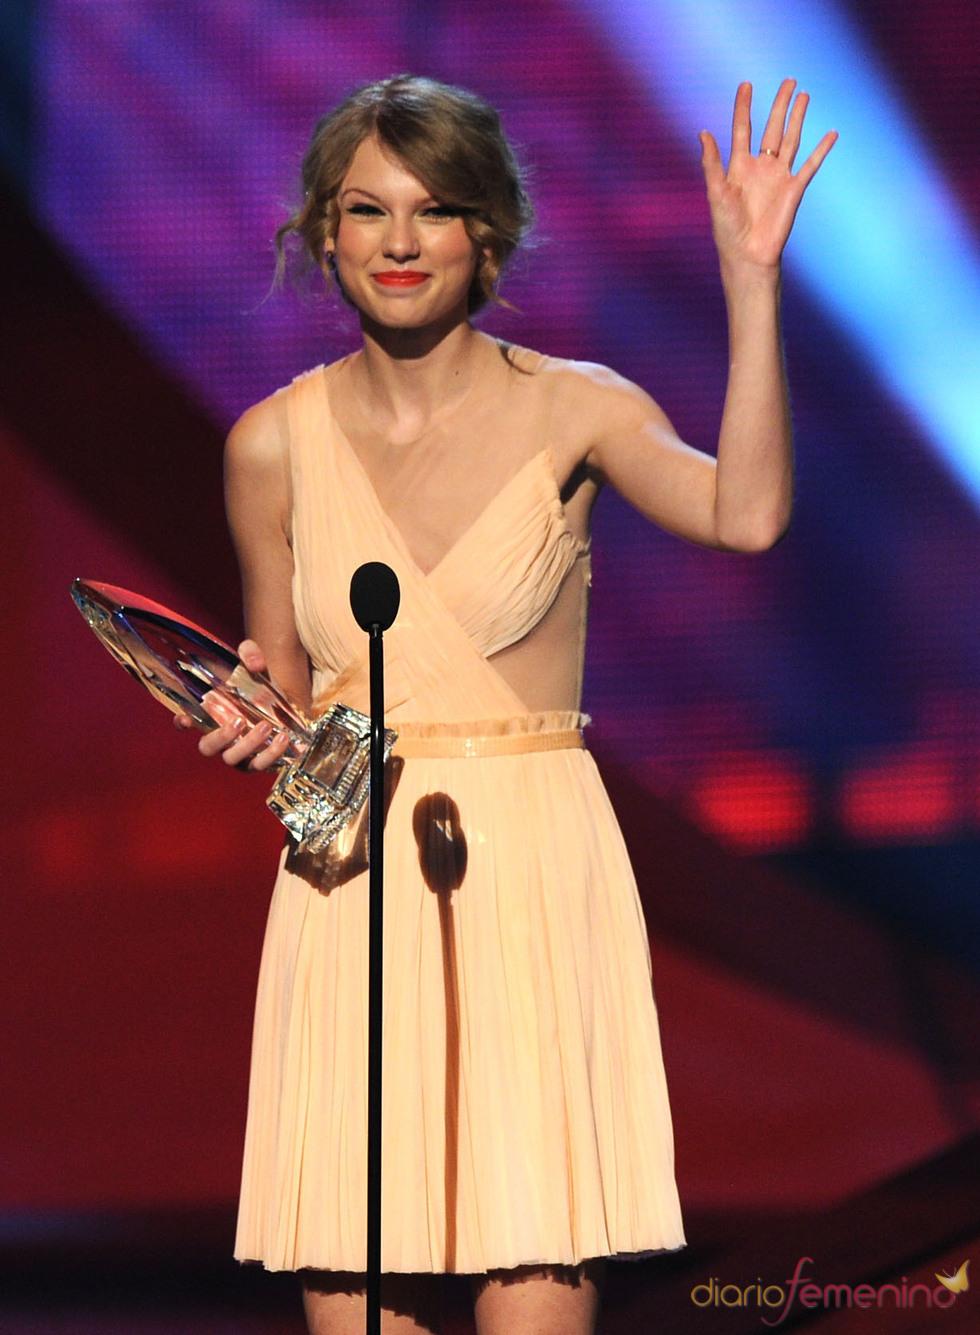 Taylor Swift en el People's Choice Awards 2011